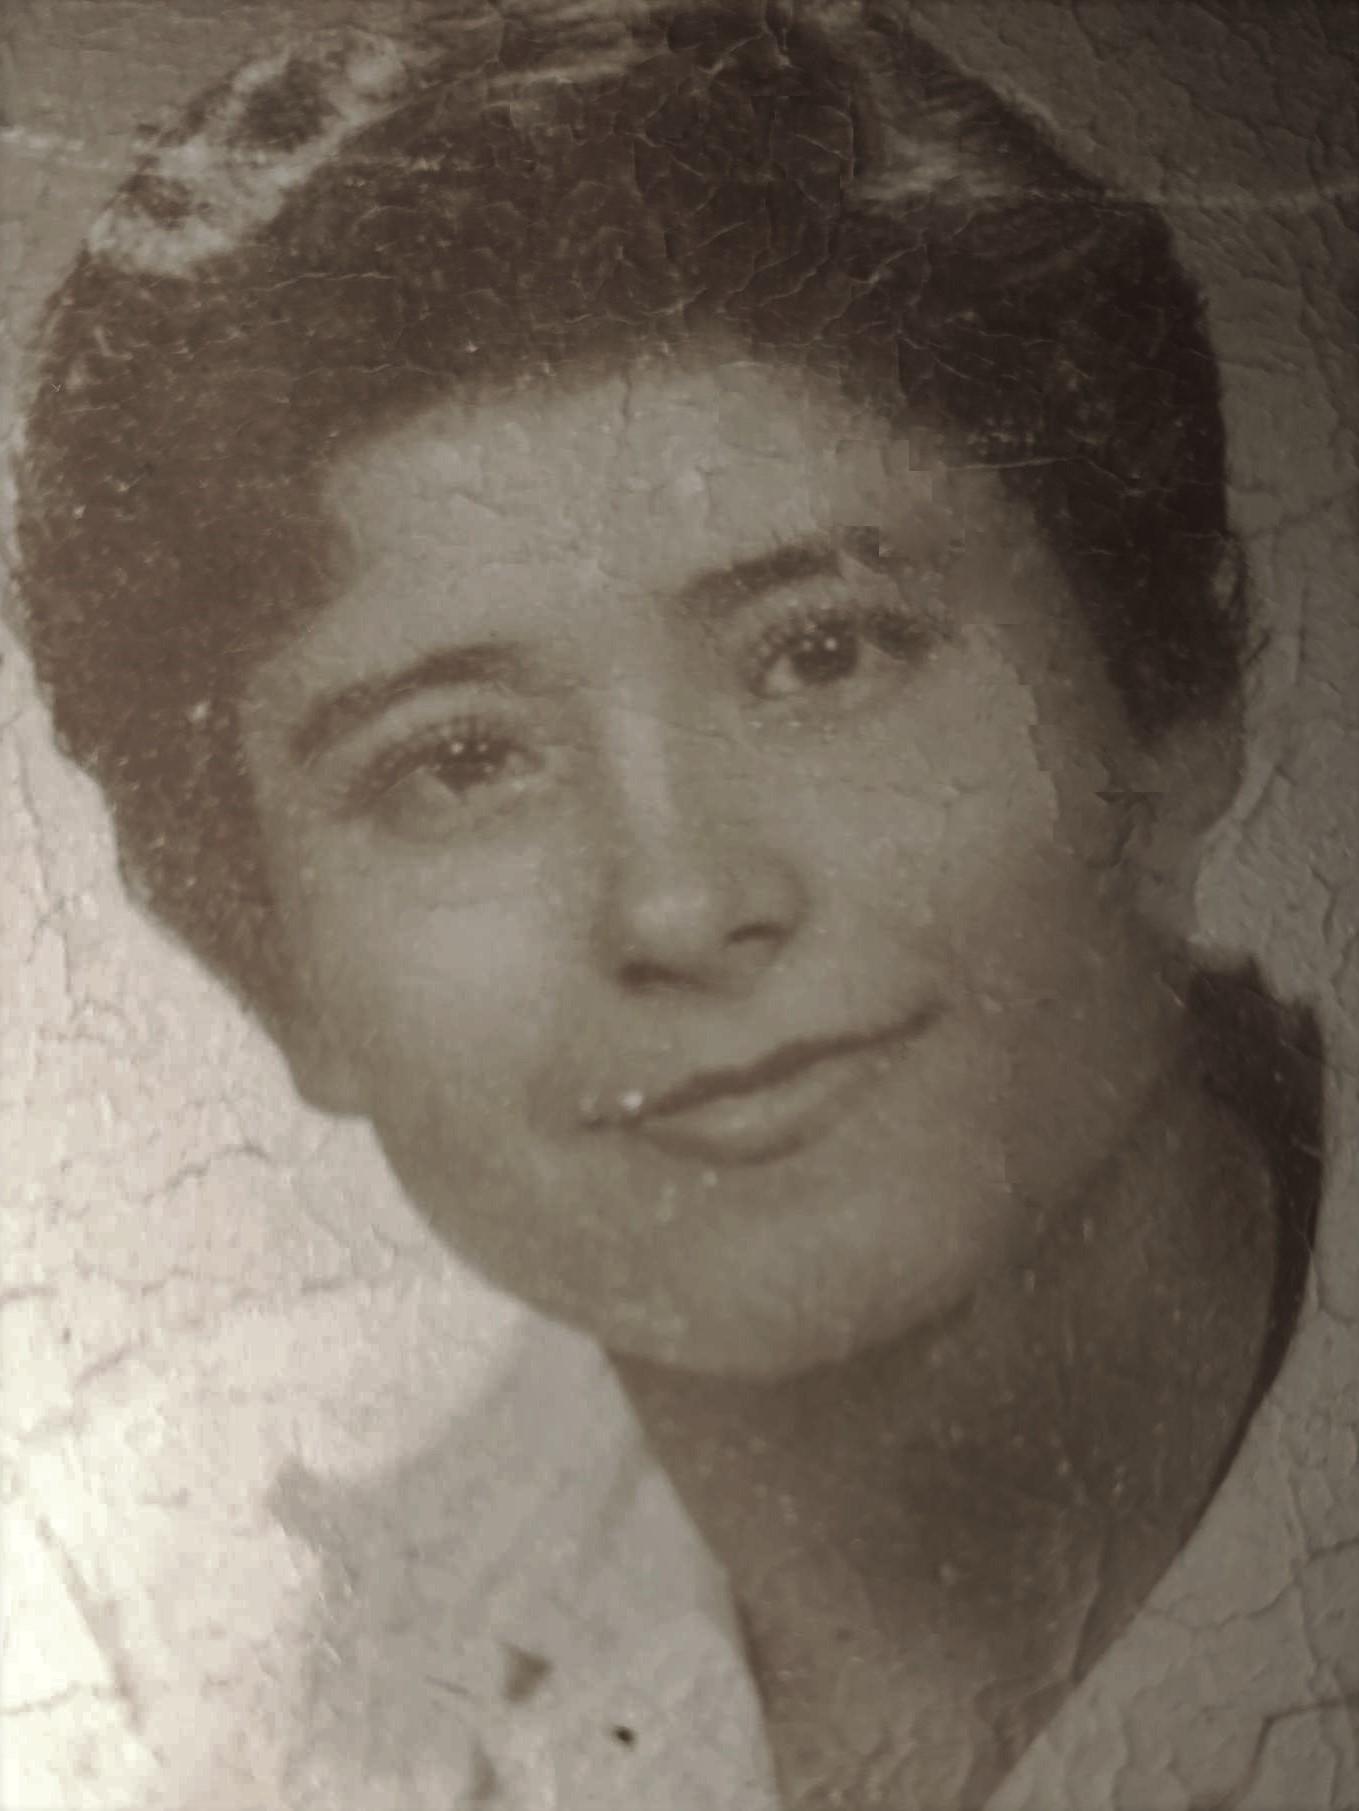 Guadalupe G. Landin